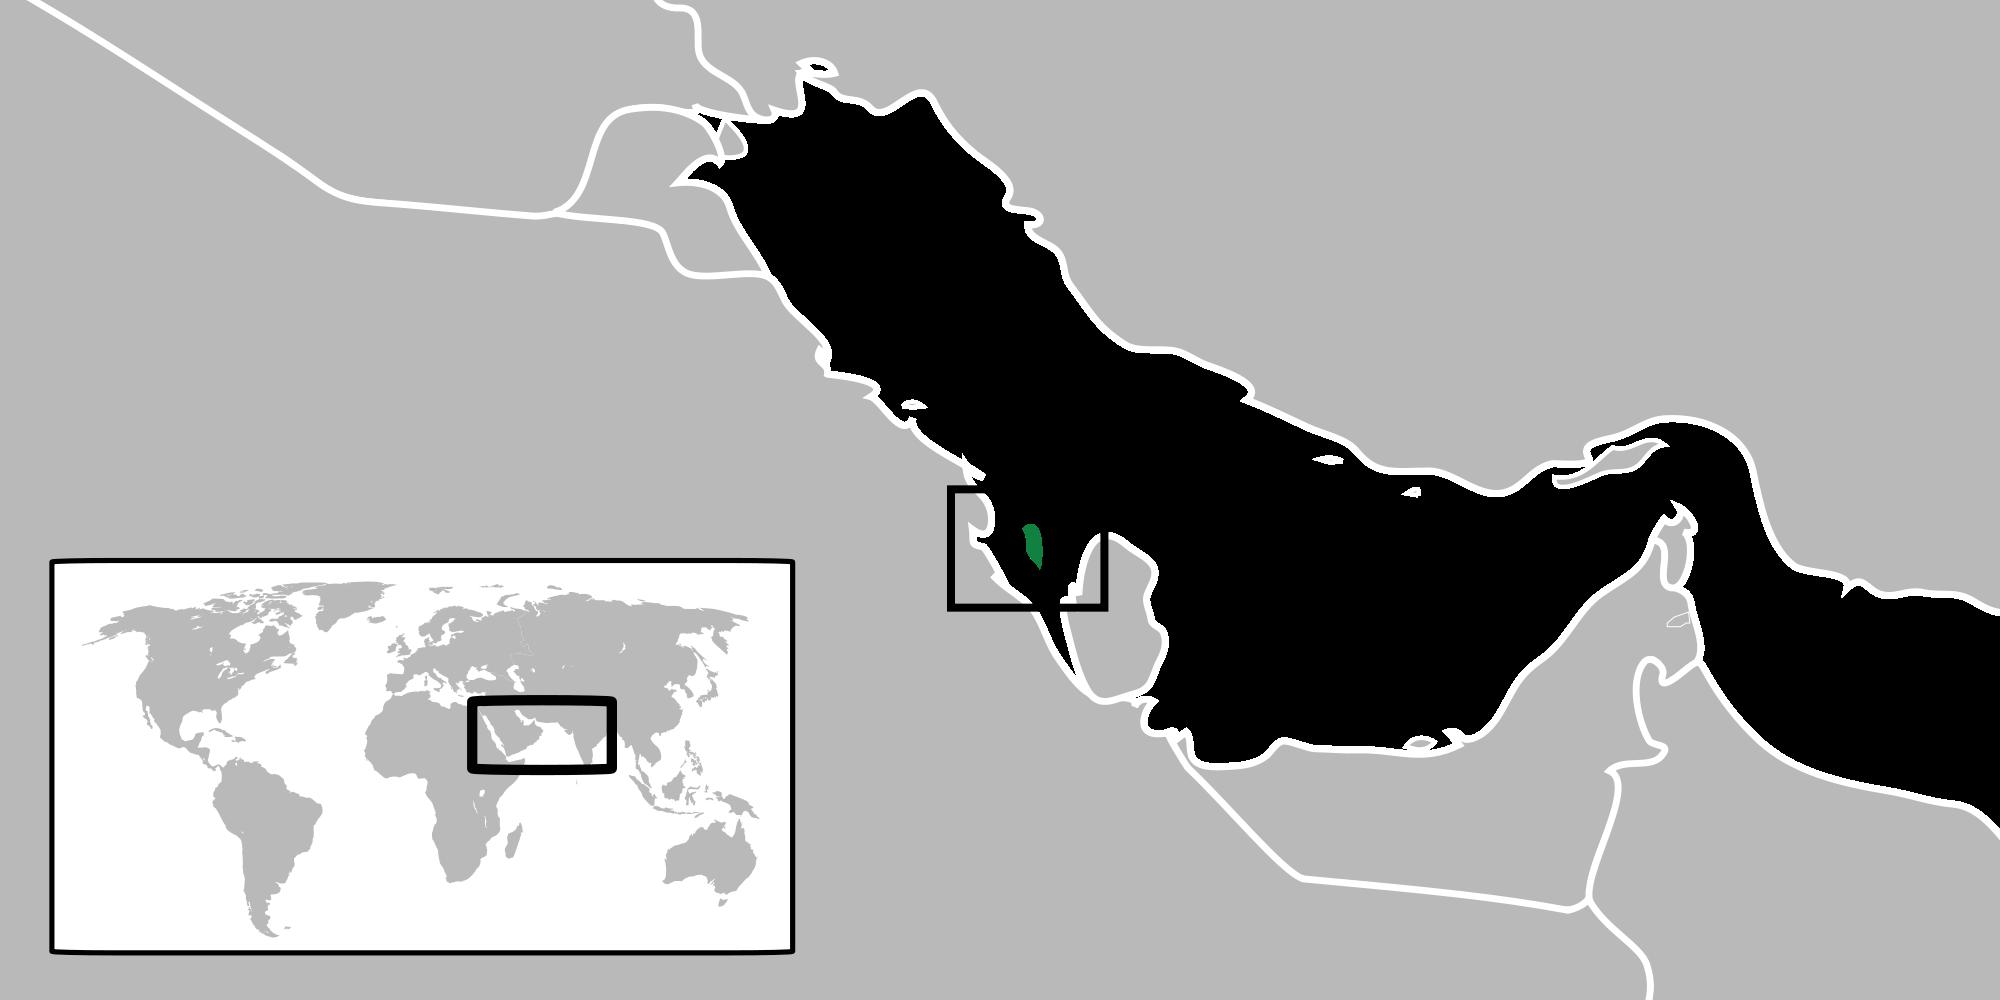 Location of the Bahrainin the World Map